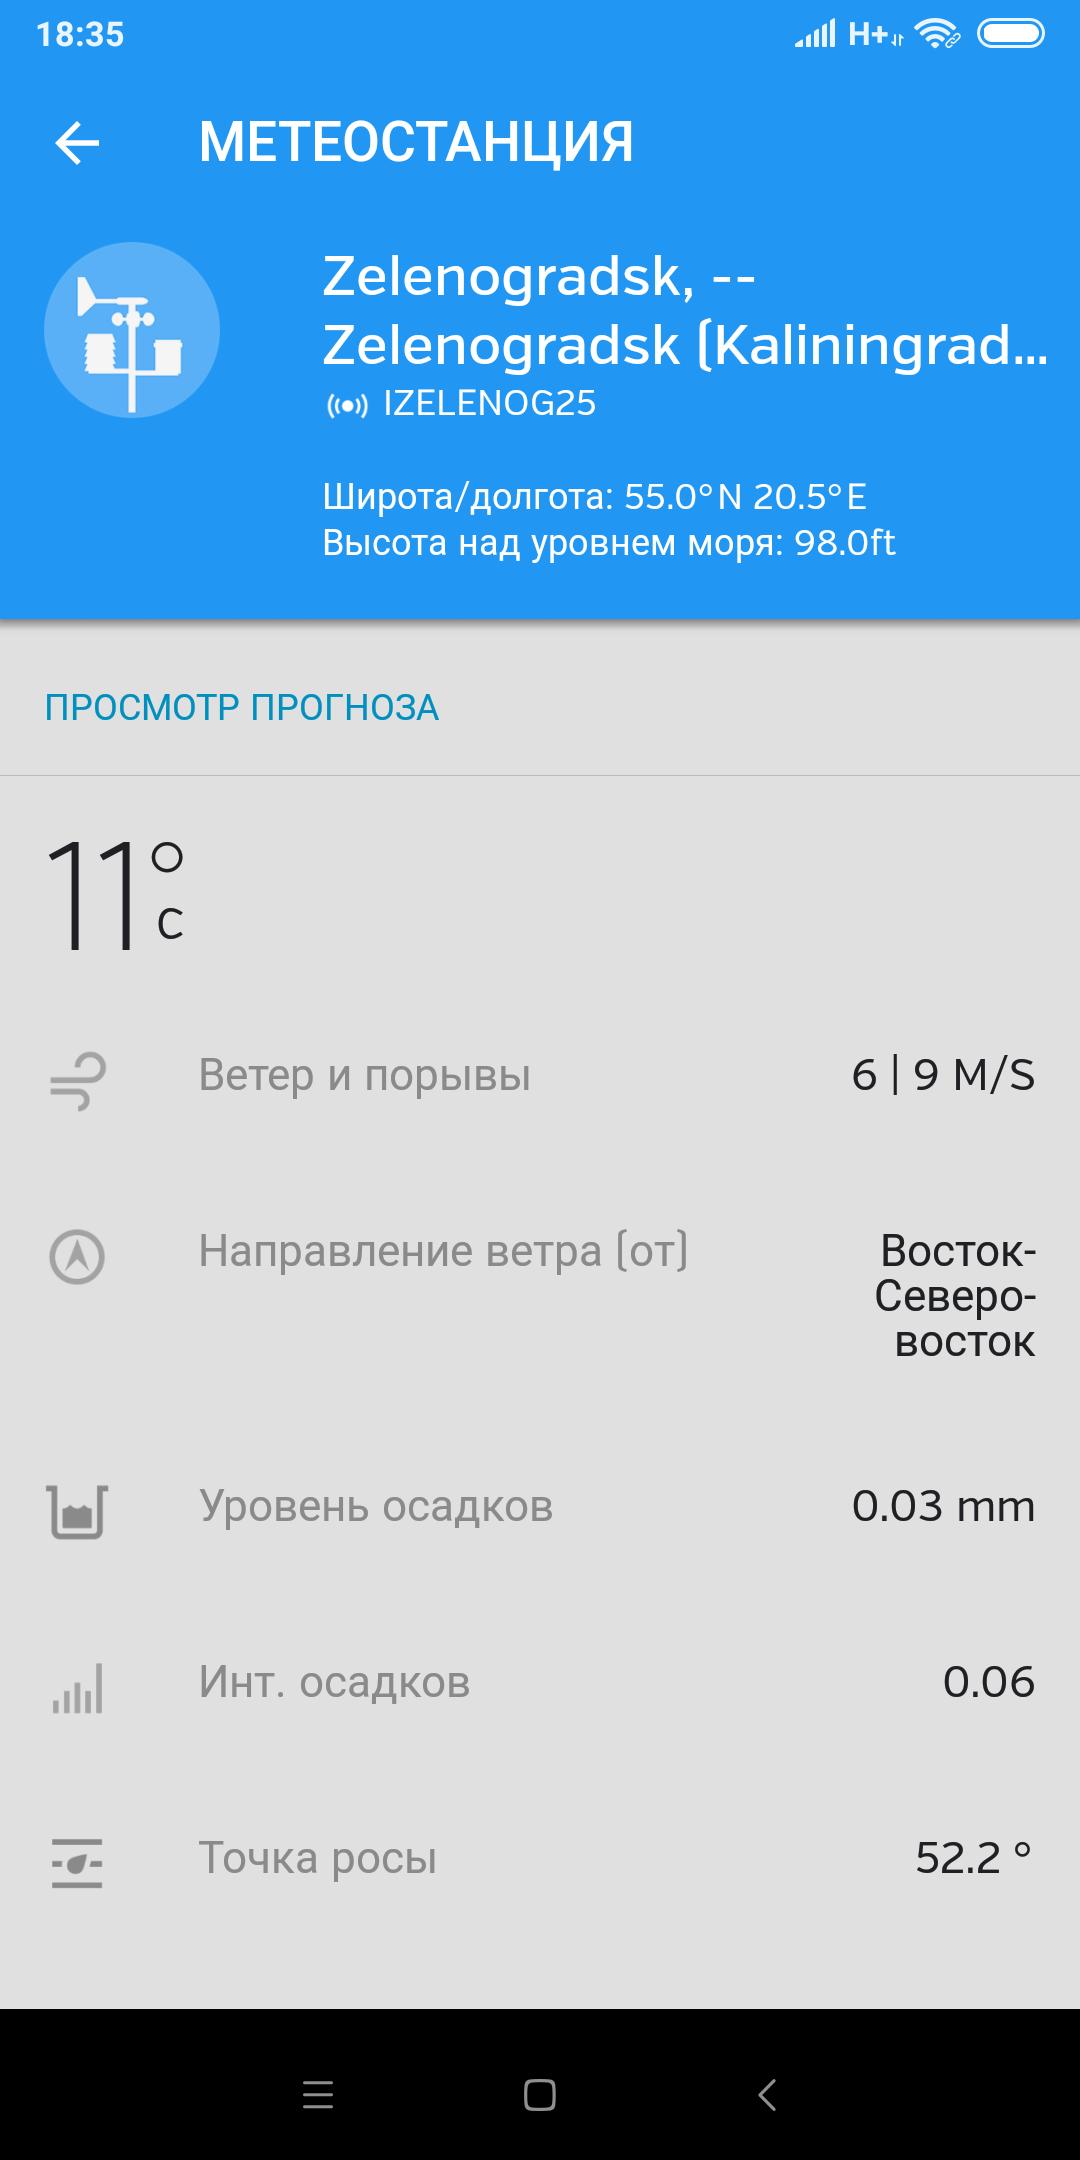 Нажмите на изображение для увеличения.  Название:Screenshot_2018-10-07-18-35-57-869_com.wunderground.android.weather.png Просмотров:0 Размер:127.4 Кб ID:219715